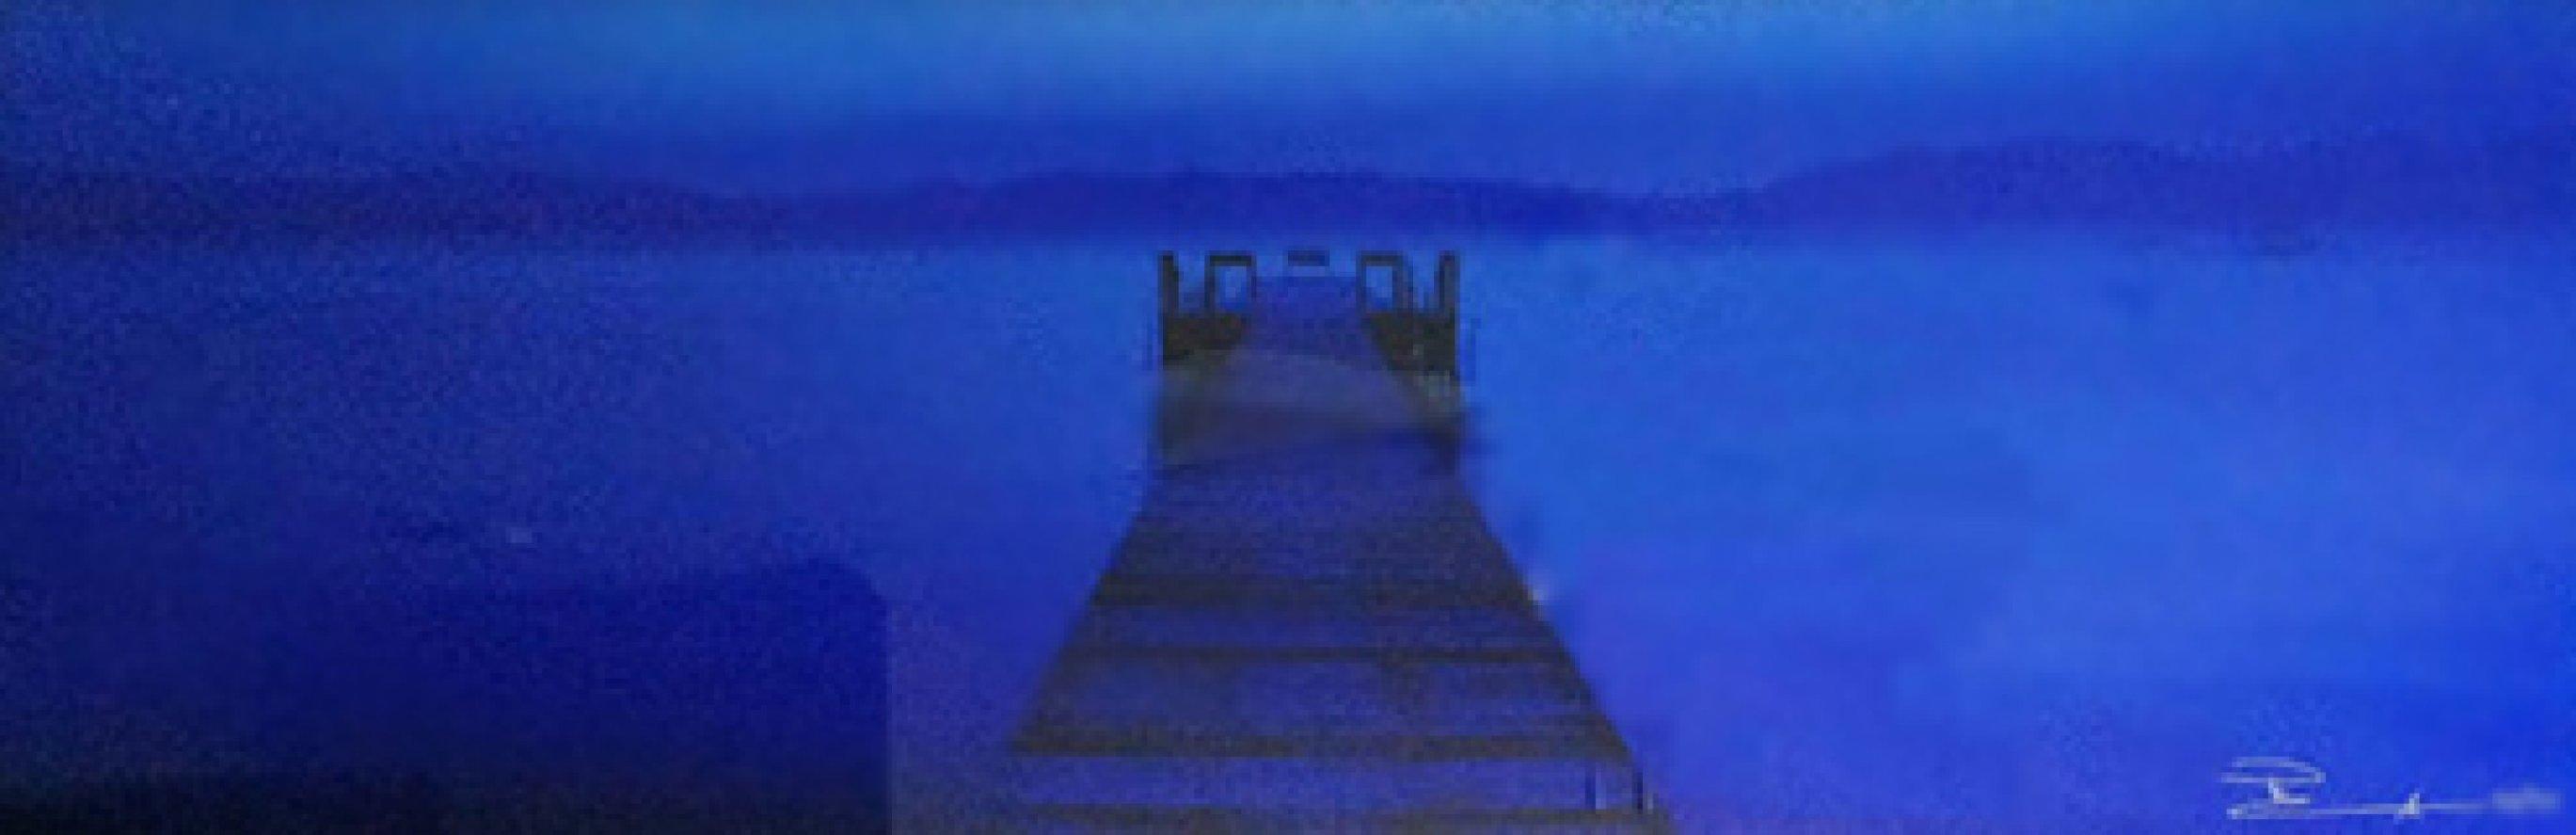 Midnight Blue (Lake Tahoe, CA) 1.5M Super Huge  Panorama by Peter Lik